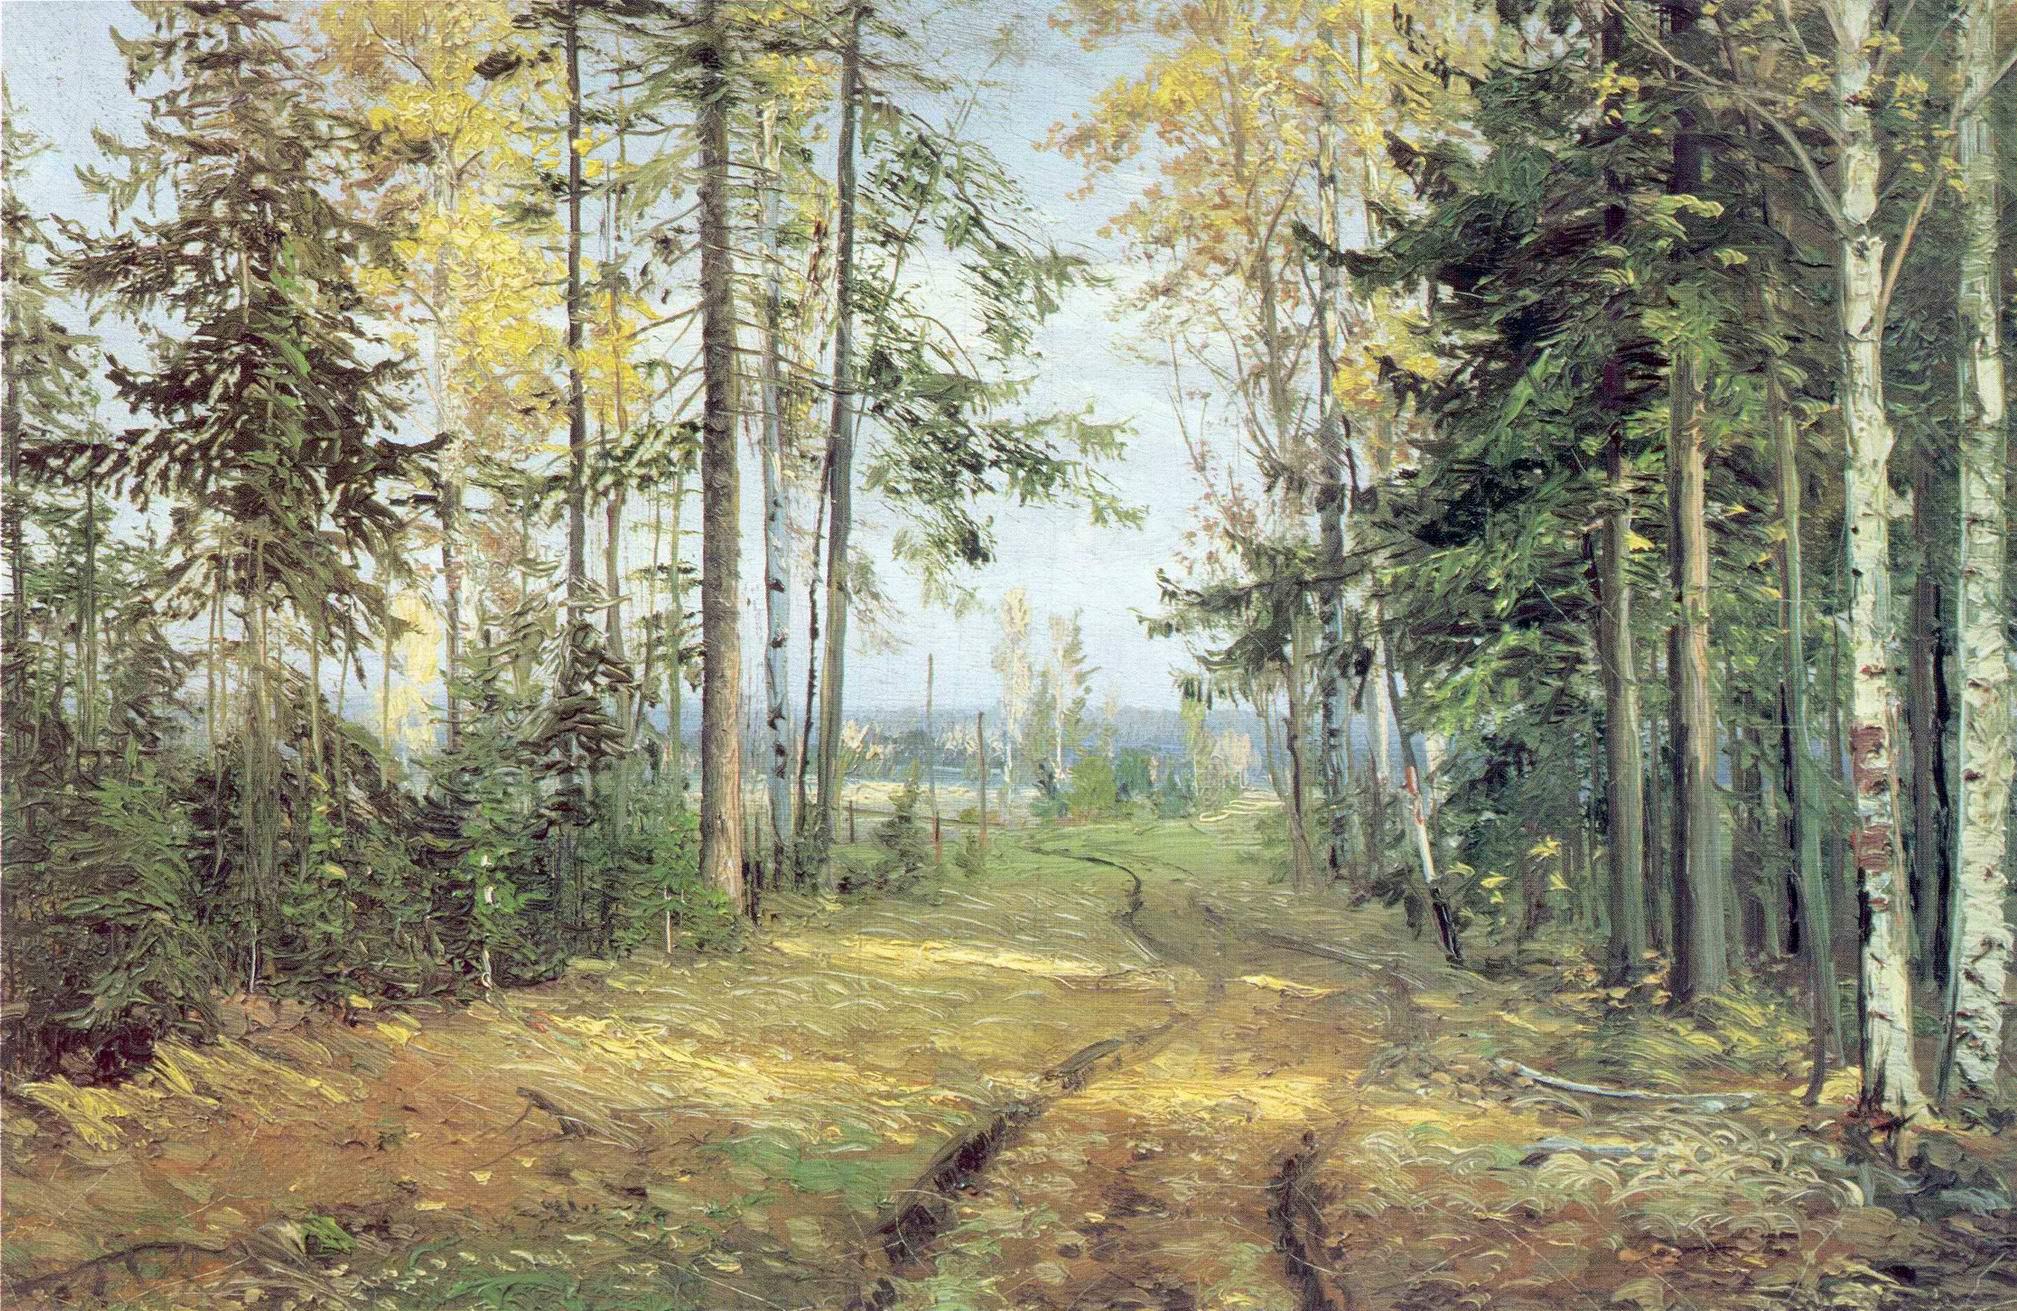 Дорога в лесу, Николай Николаевич Ге